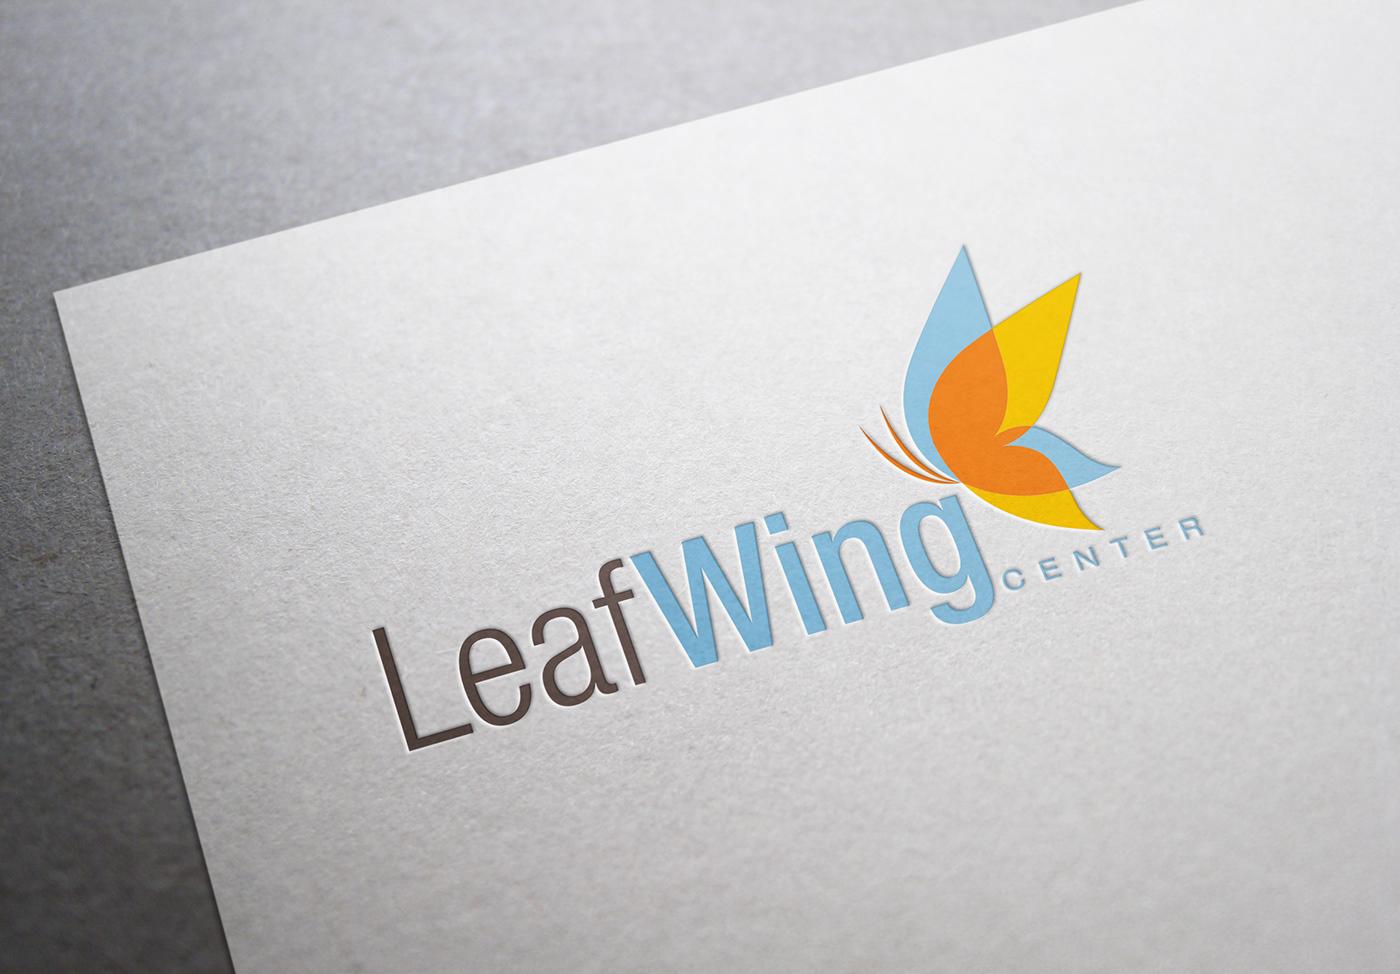 LeafWing Center Logo